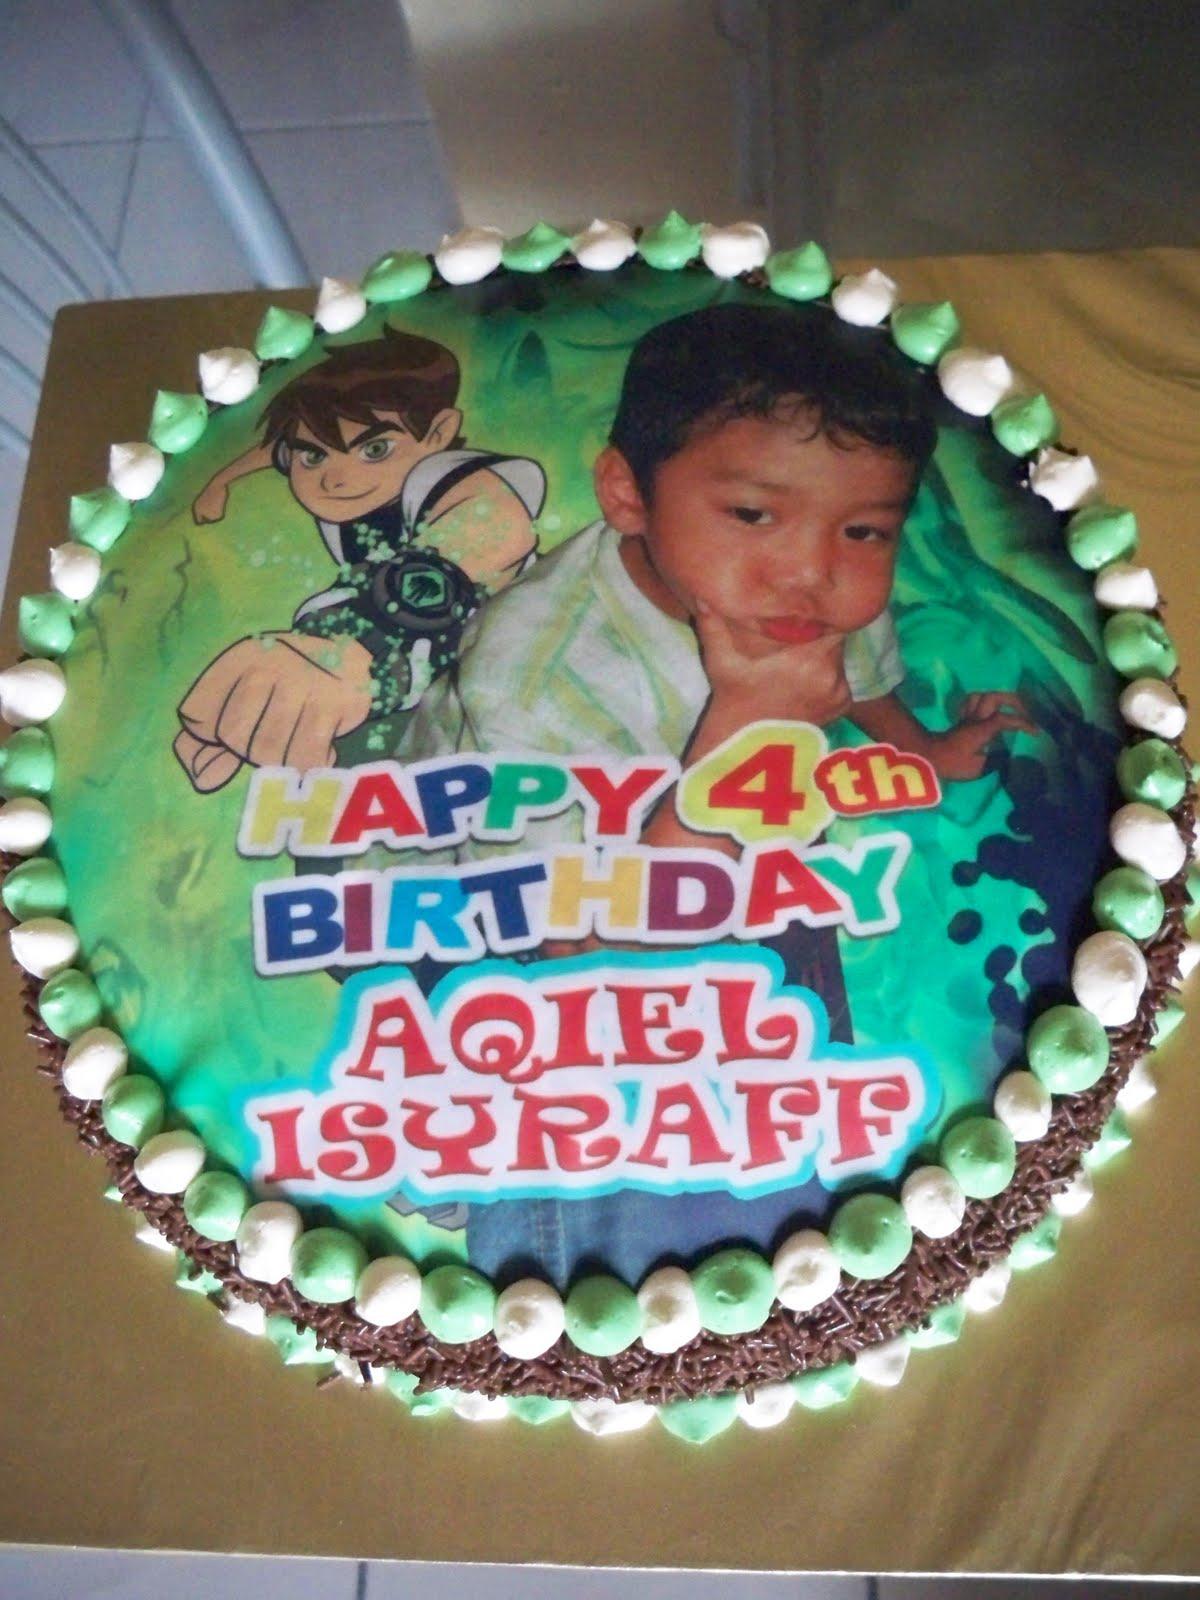 Ayulicious Cakes Cupcakes N Desserts 012 625 7307 Ayu